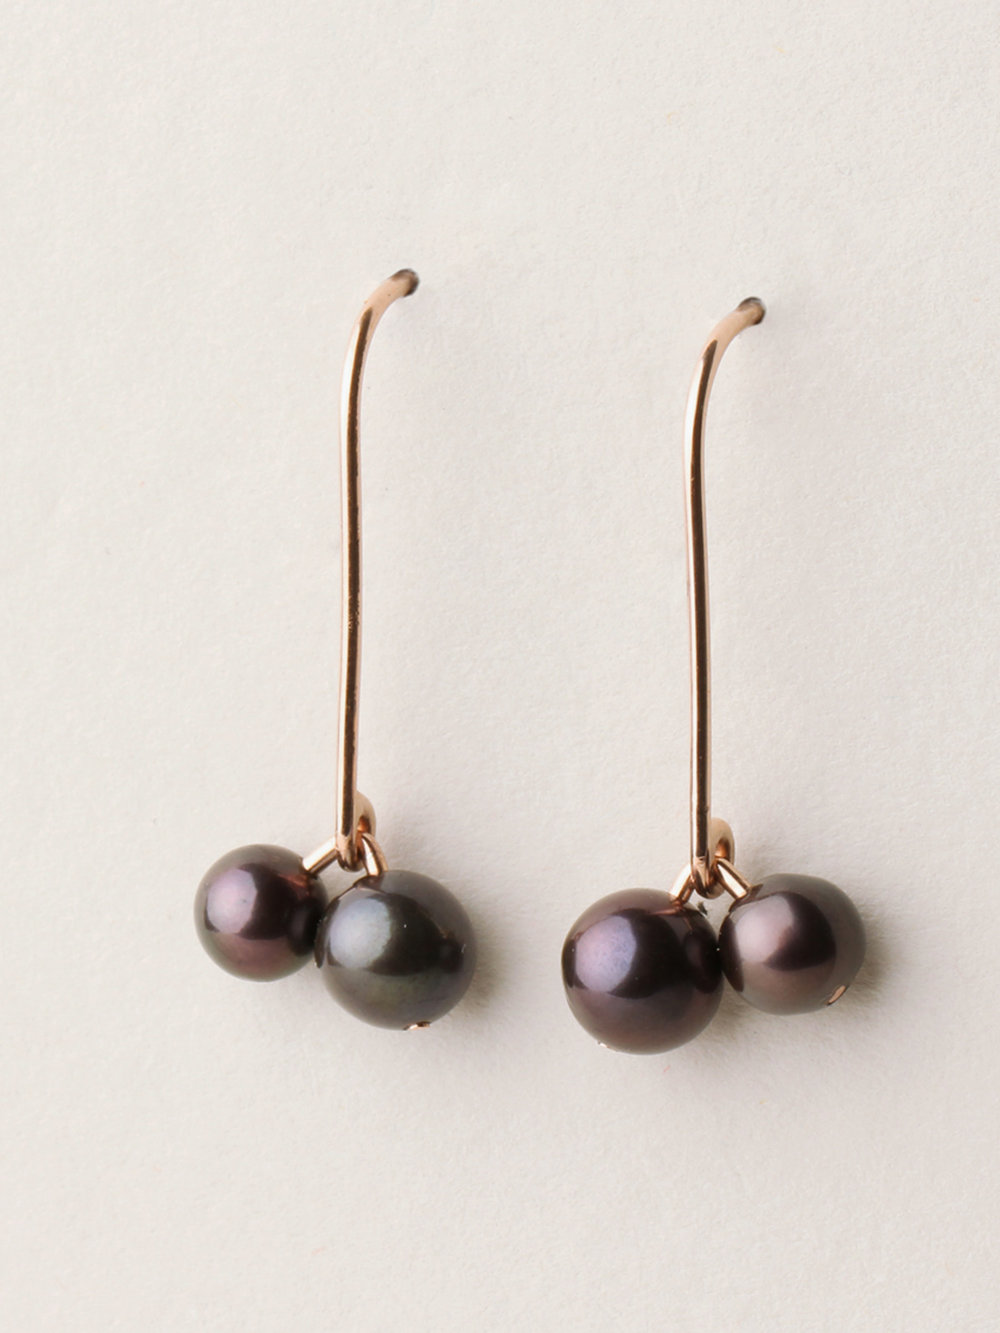 Perlen Ohrhänger, lang mit 2 Perlen in 585 Rosegold und echten Süßwasserzuchtperlen  Pearl earrings, long with 2 pearls in 14kt Rosegold and sweetwater pearls